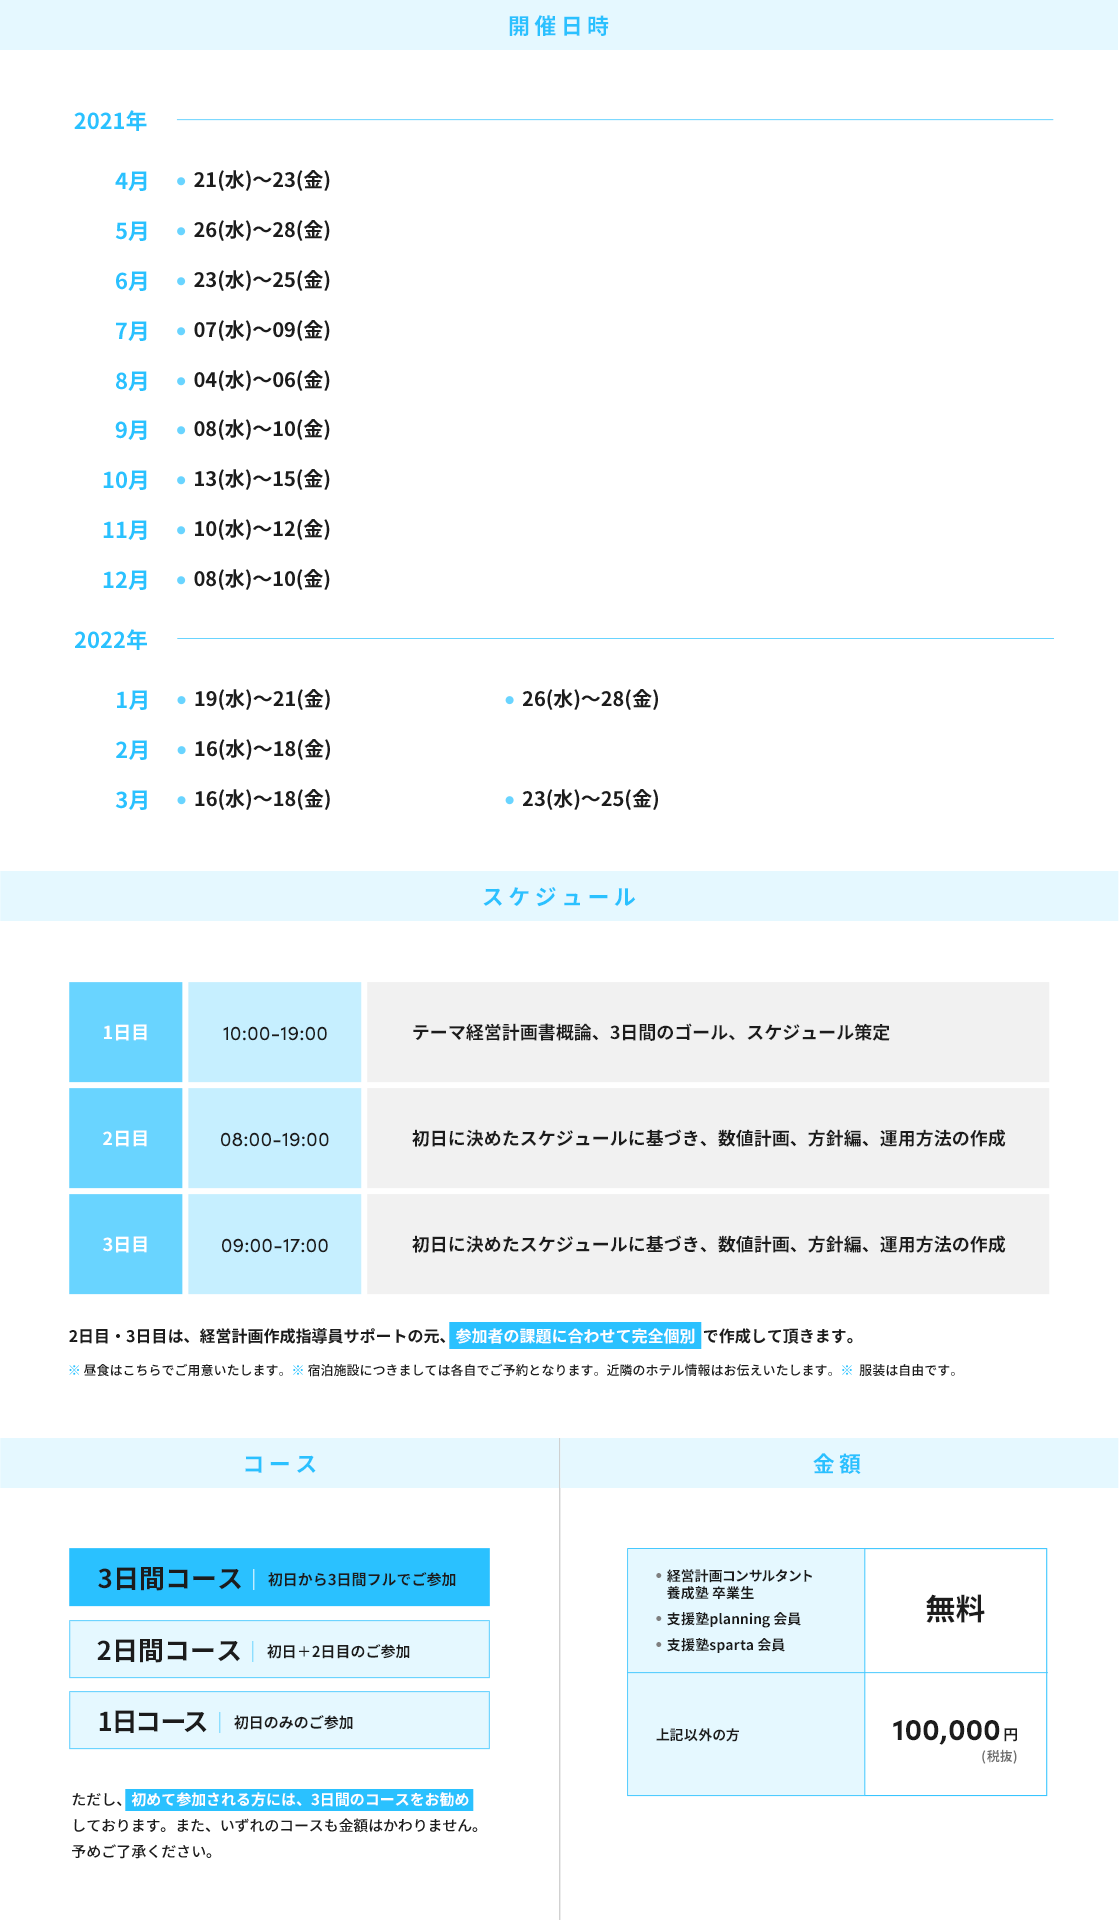 image03-1_pc